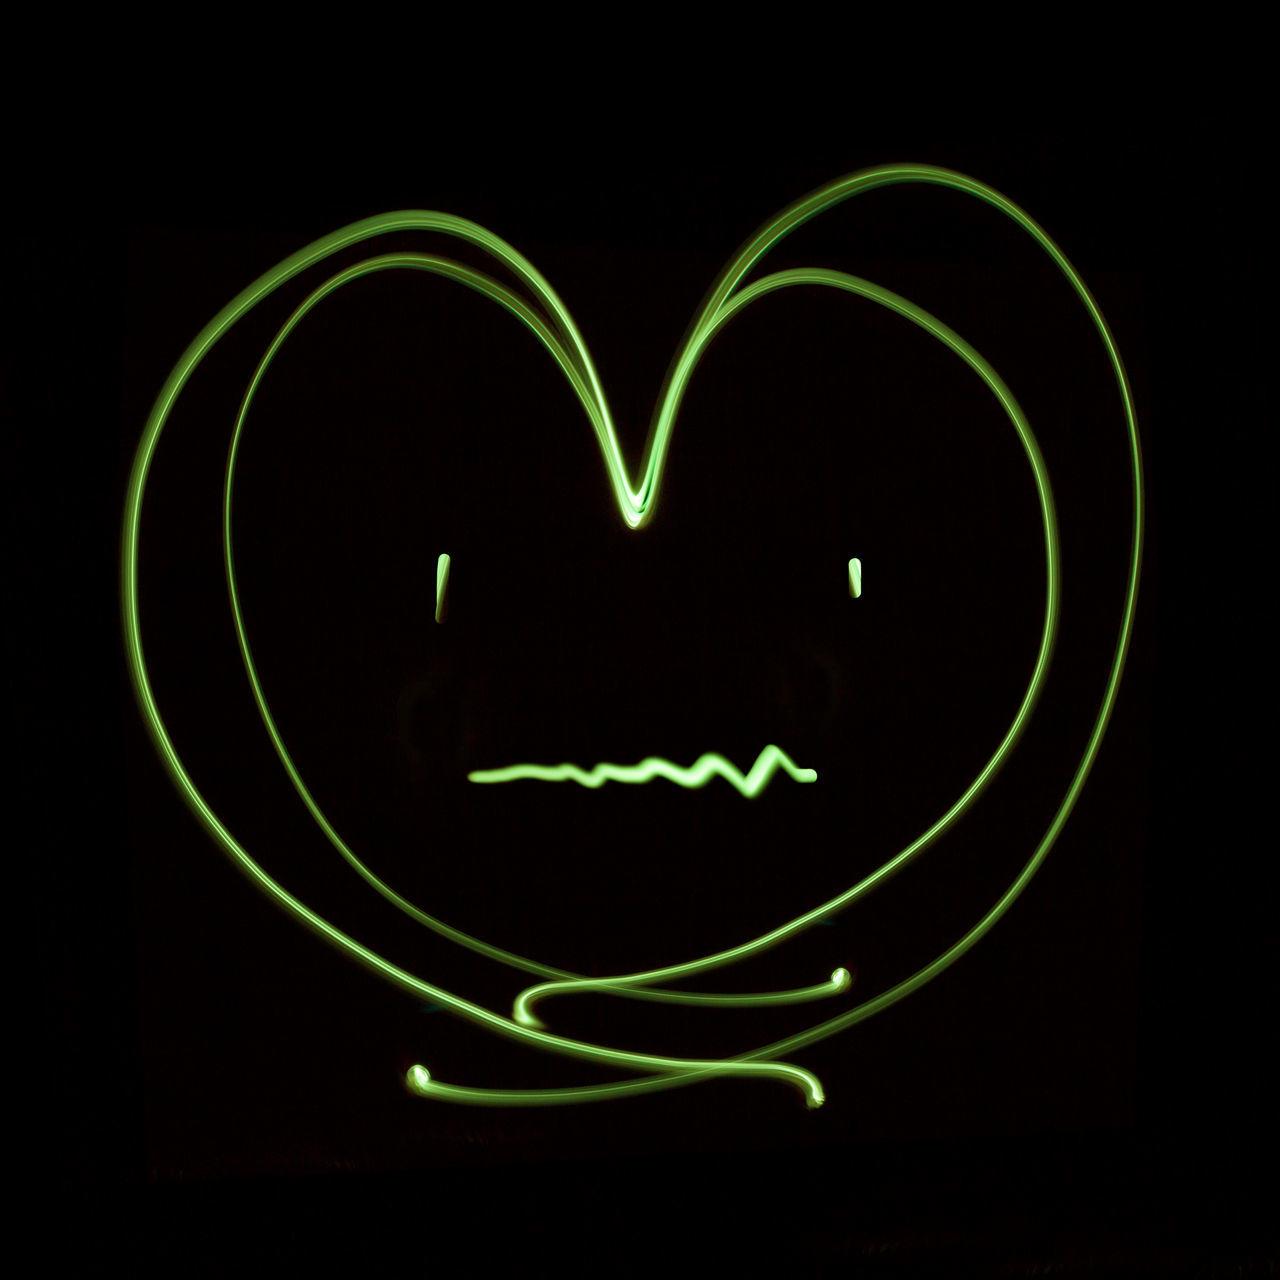 Heart patient Abstract Cold Winter ❄⛄ Colds Concept Design Effect Flu Glow Green Heart Patient Heart ❤ Ideas Light LINE Long Exposure Love ♥ Neon Lights Patient Pulse Sad & Lonely Symbol Valentine's Day  Weak